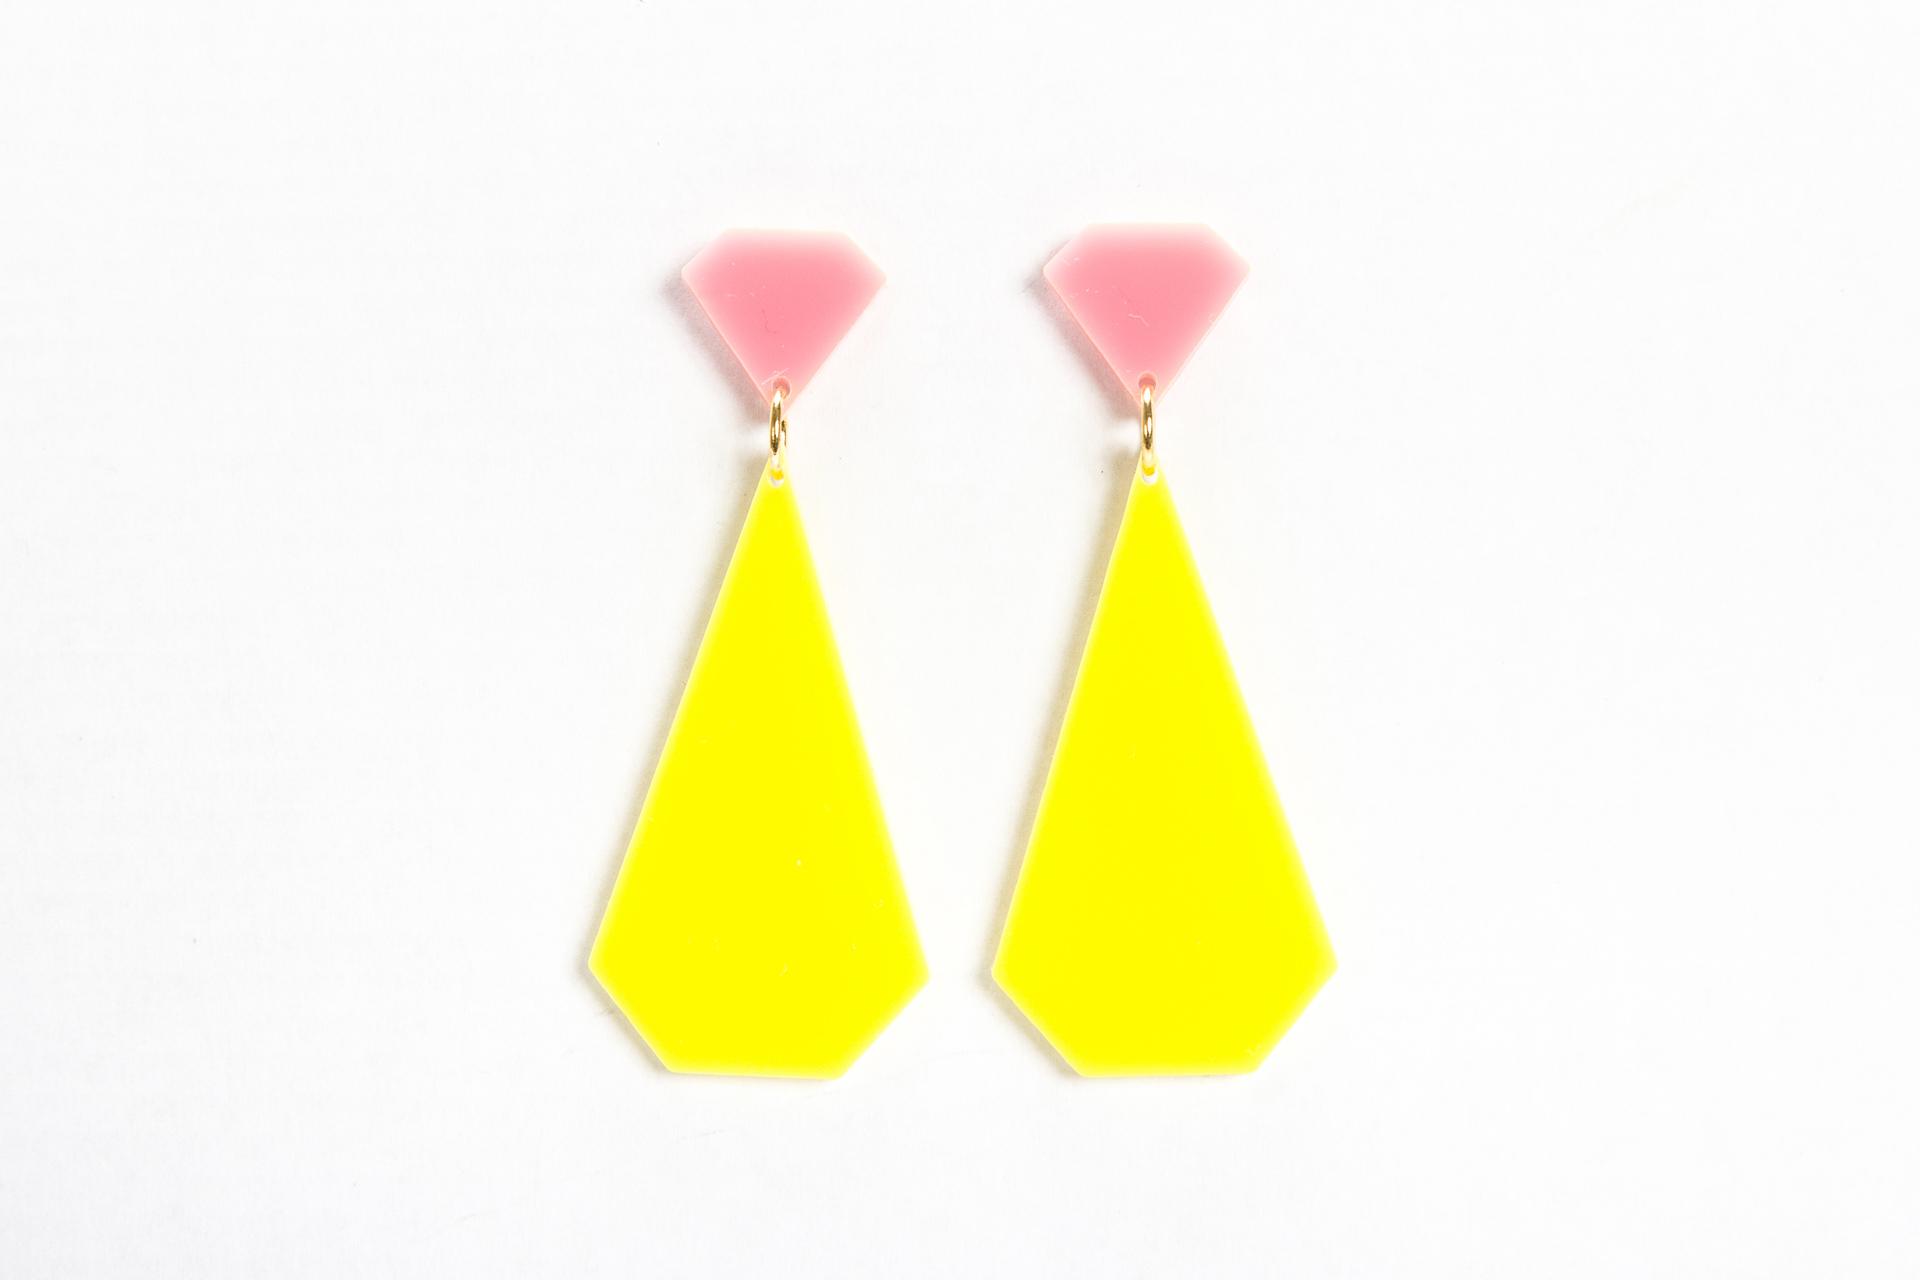 E2RD, My diamonds Collection, earrings